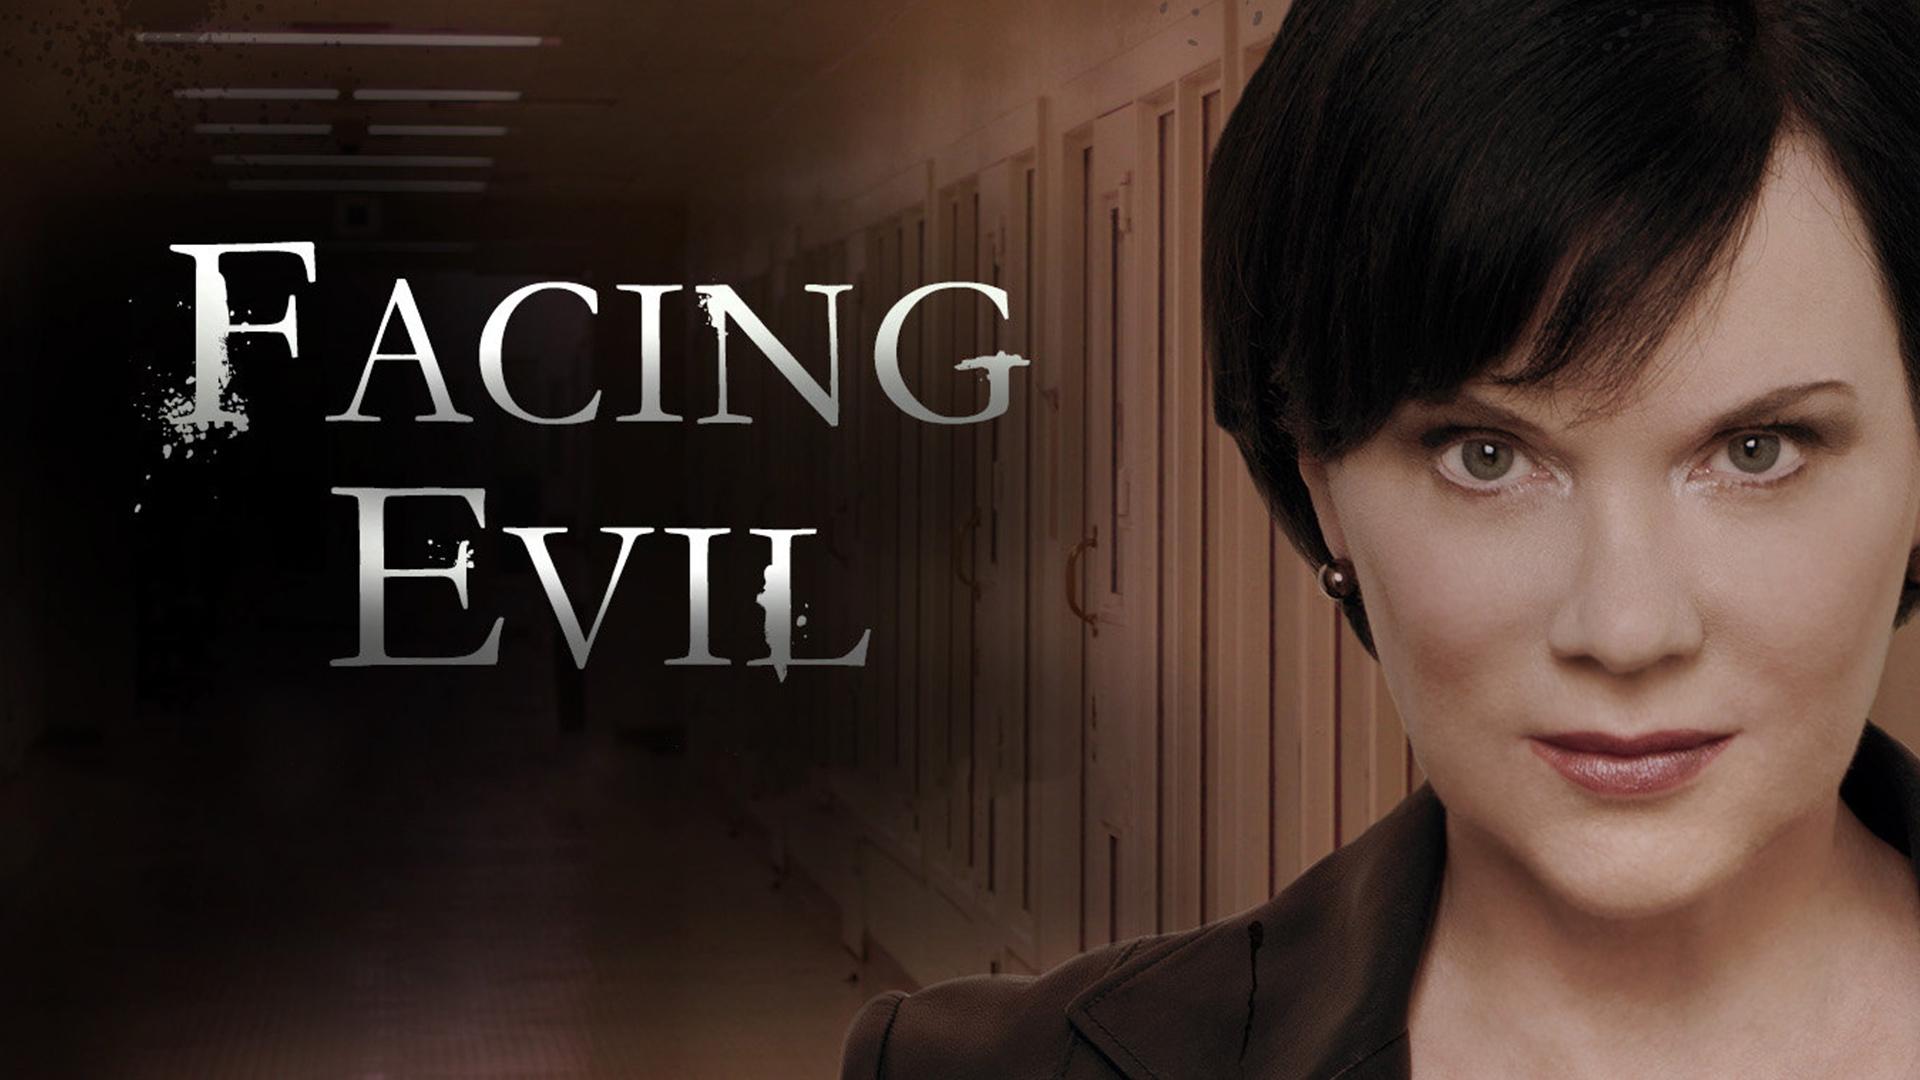 Facing Evil Season 1